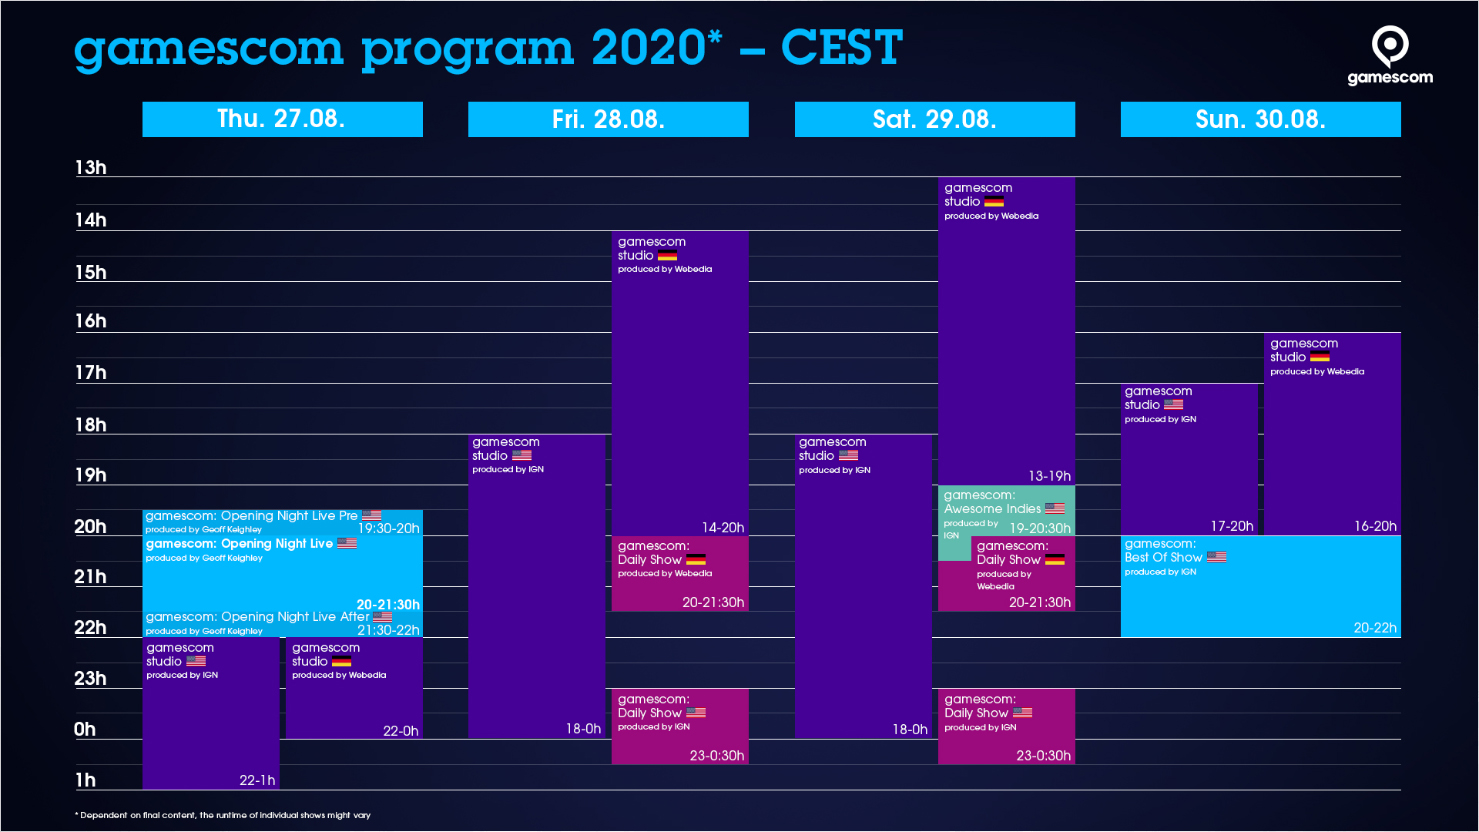 gamescom 2020 : Planning